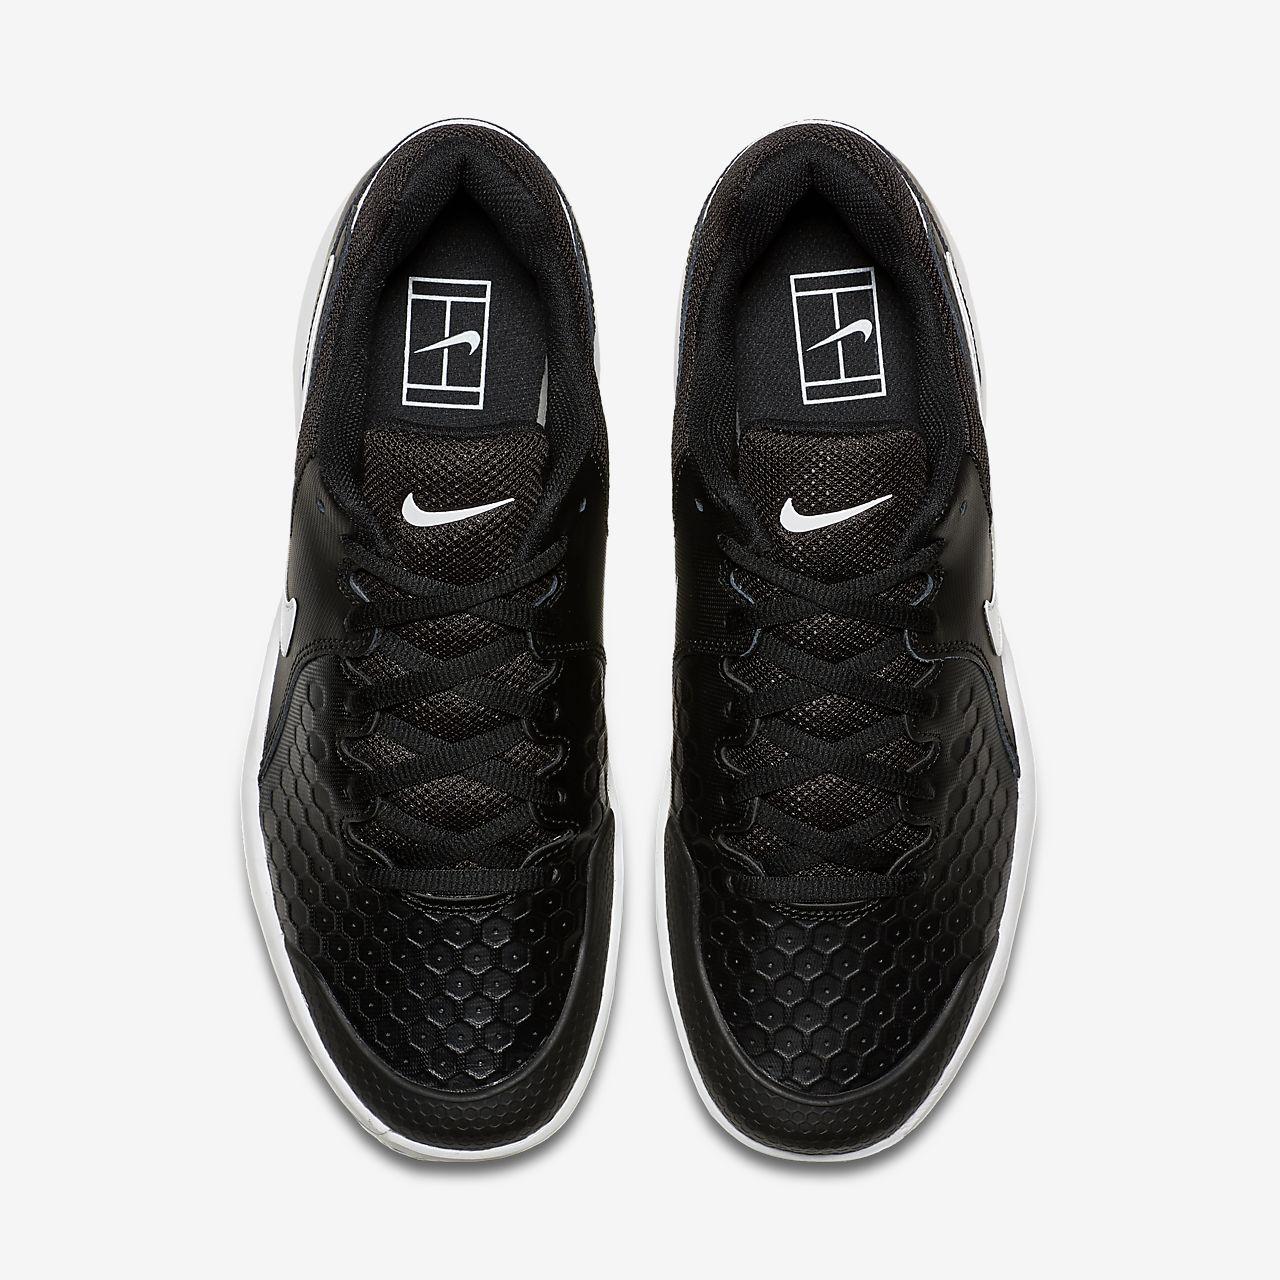 NikeCourt Air Zoom Resistance HC Herren-Tennisschuh